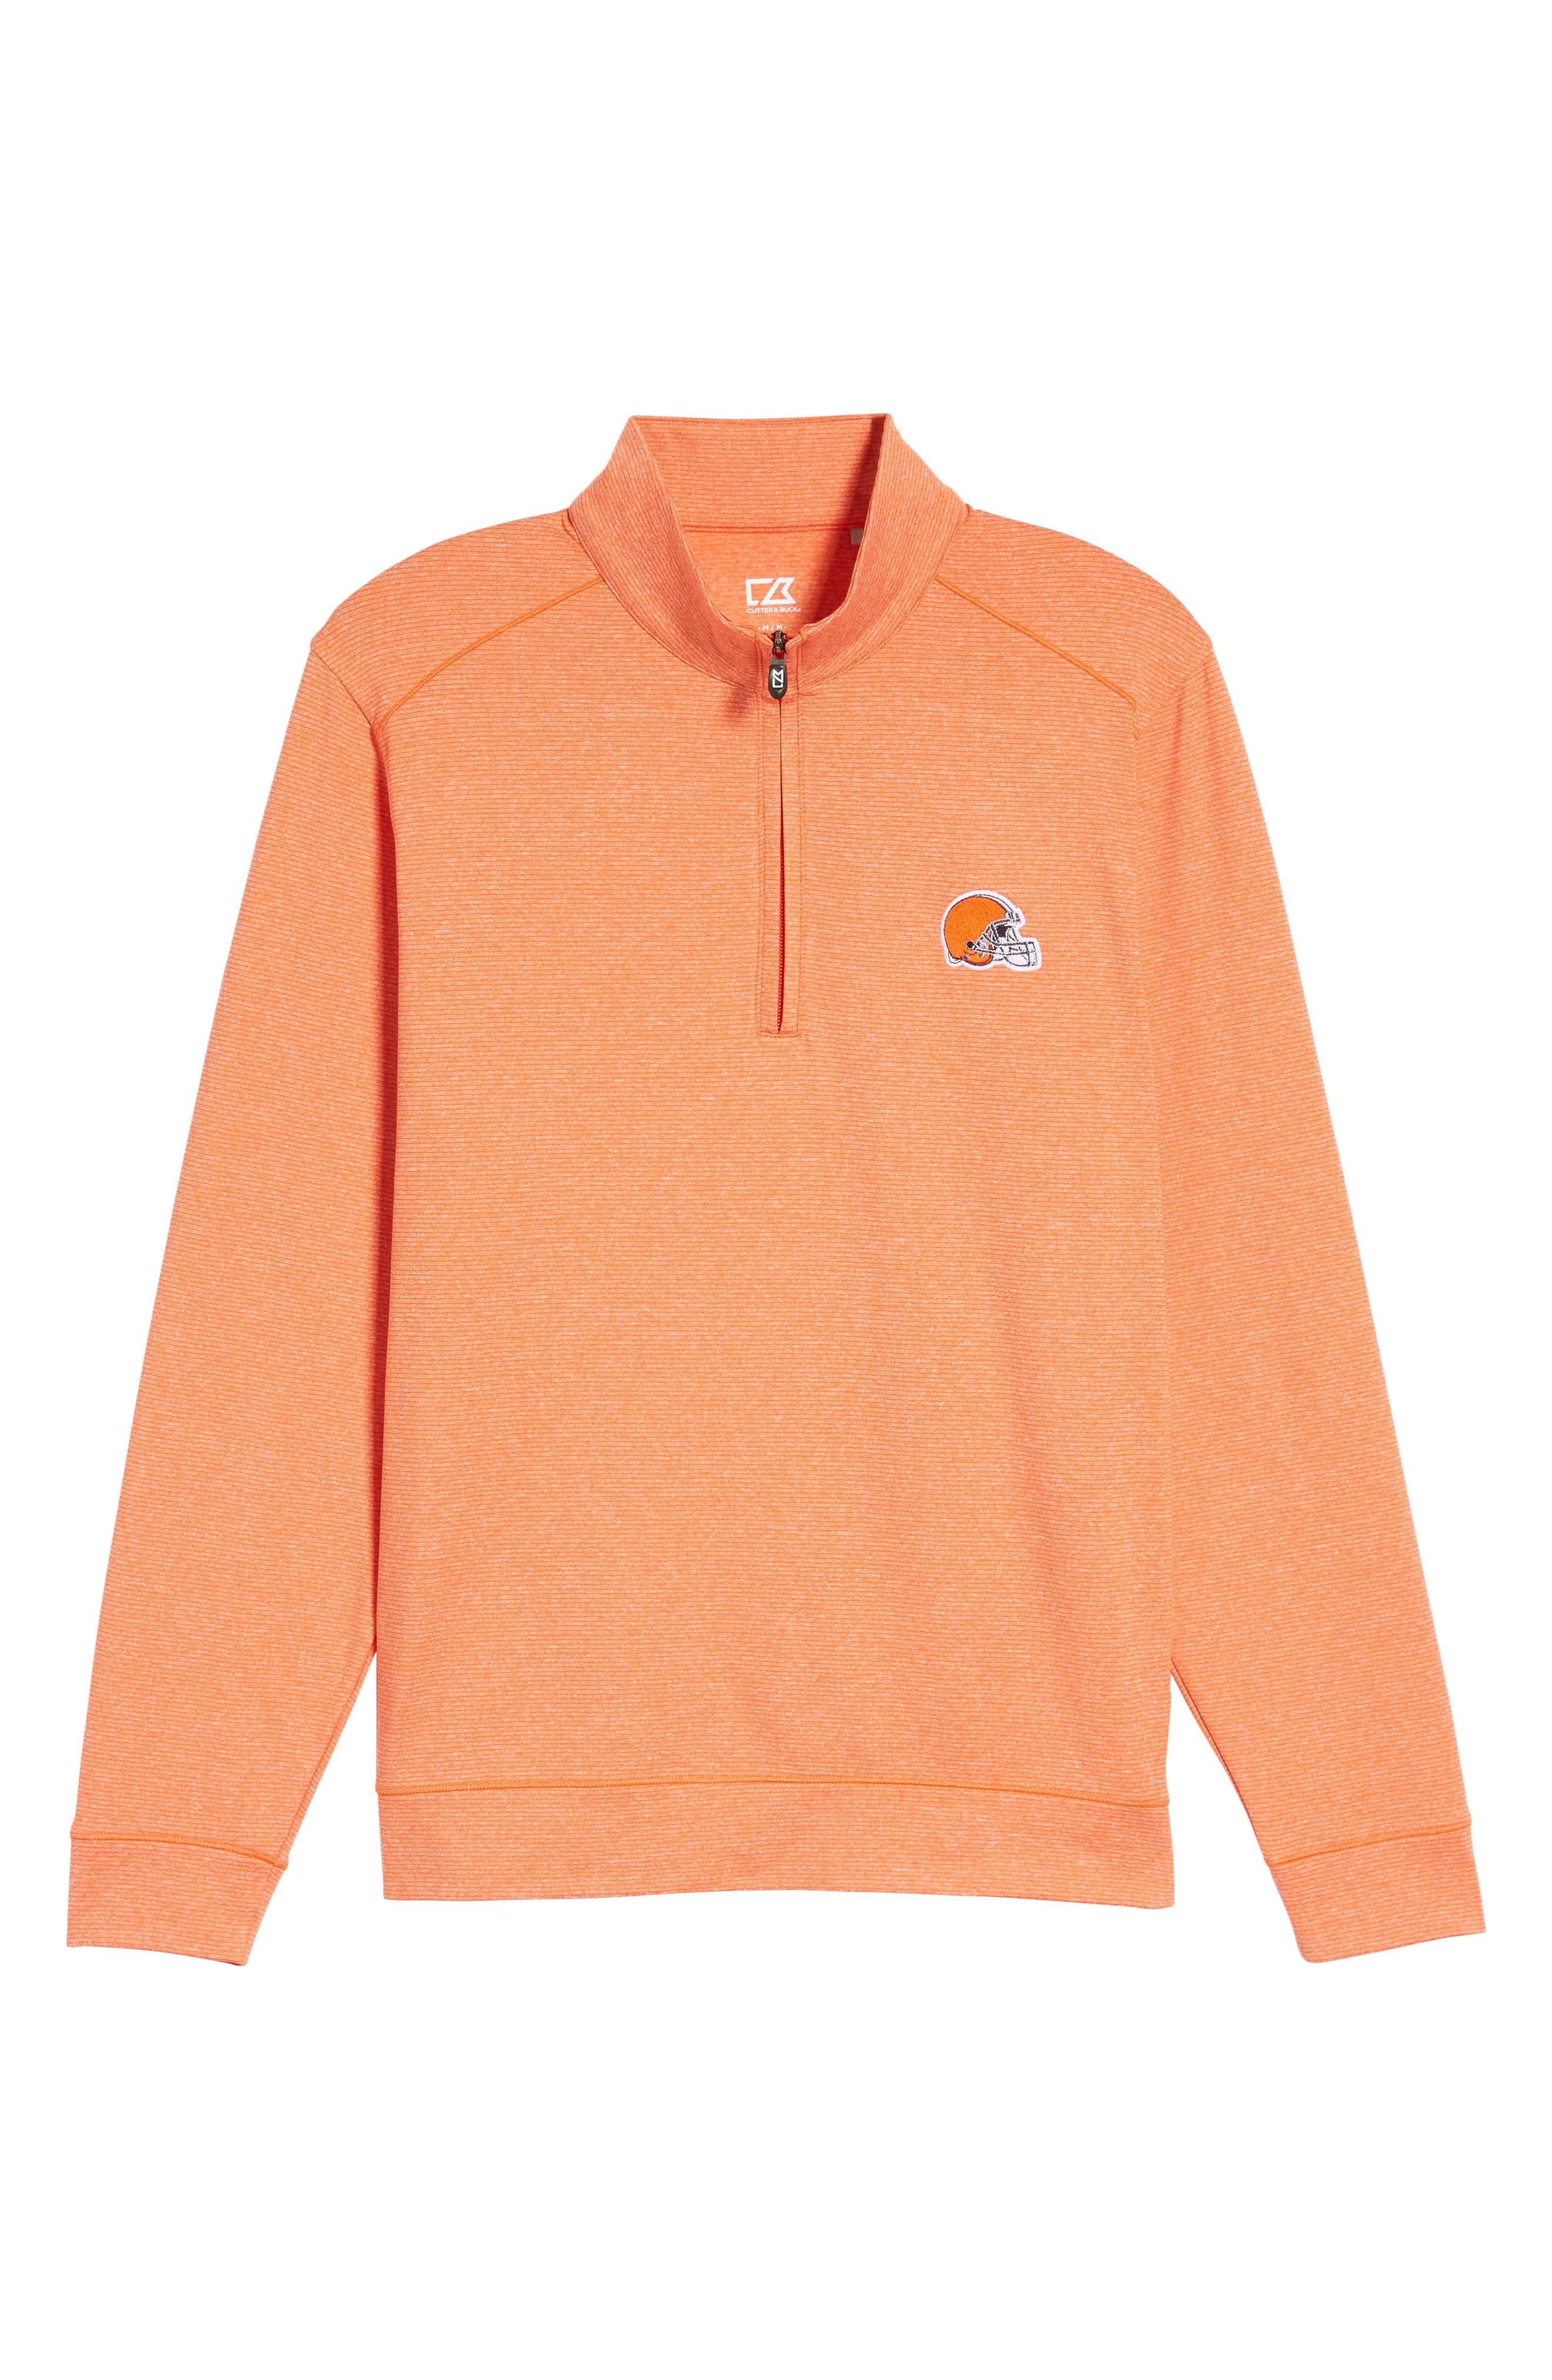 Shoreline - Cleveland Browns Half Zip Pullover,                             Alternate thumbnail 6, color,                             816